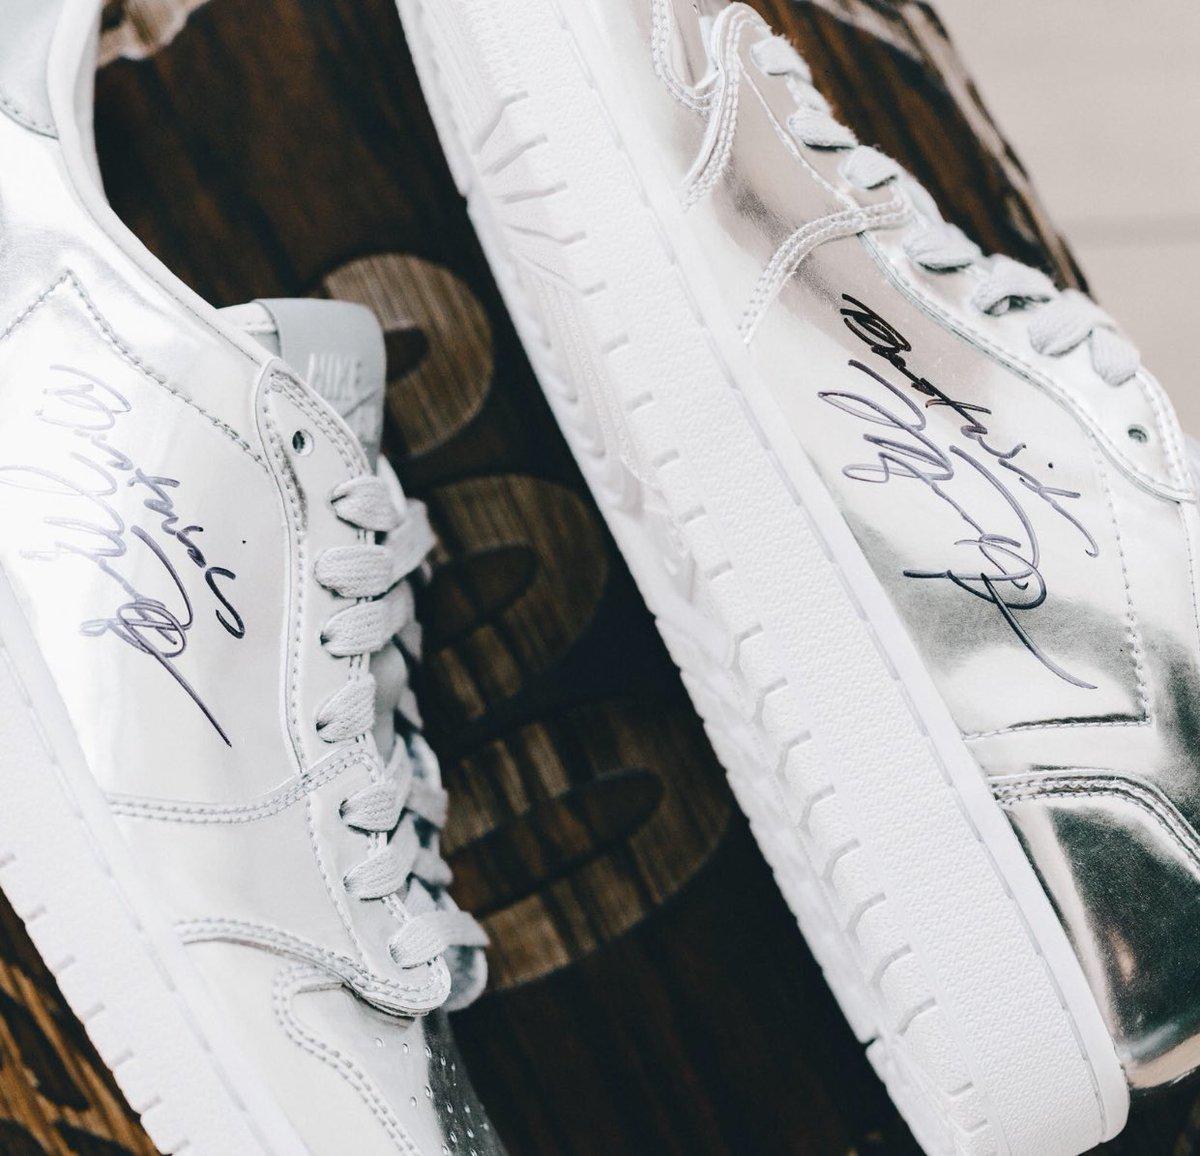 c6ff35ed9363 Up close look at the shoes (Air Jordan 1 Pinnacle Lows) that Nike   Michael  Jordan gave Roy Williams for his 800th win